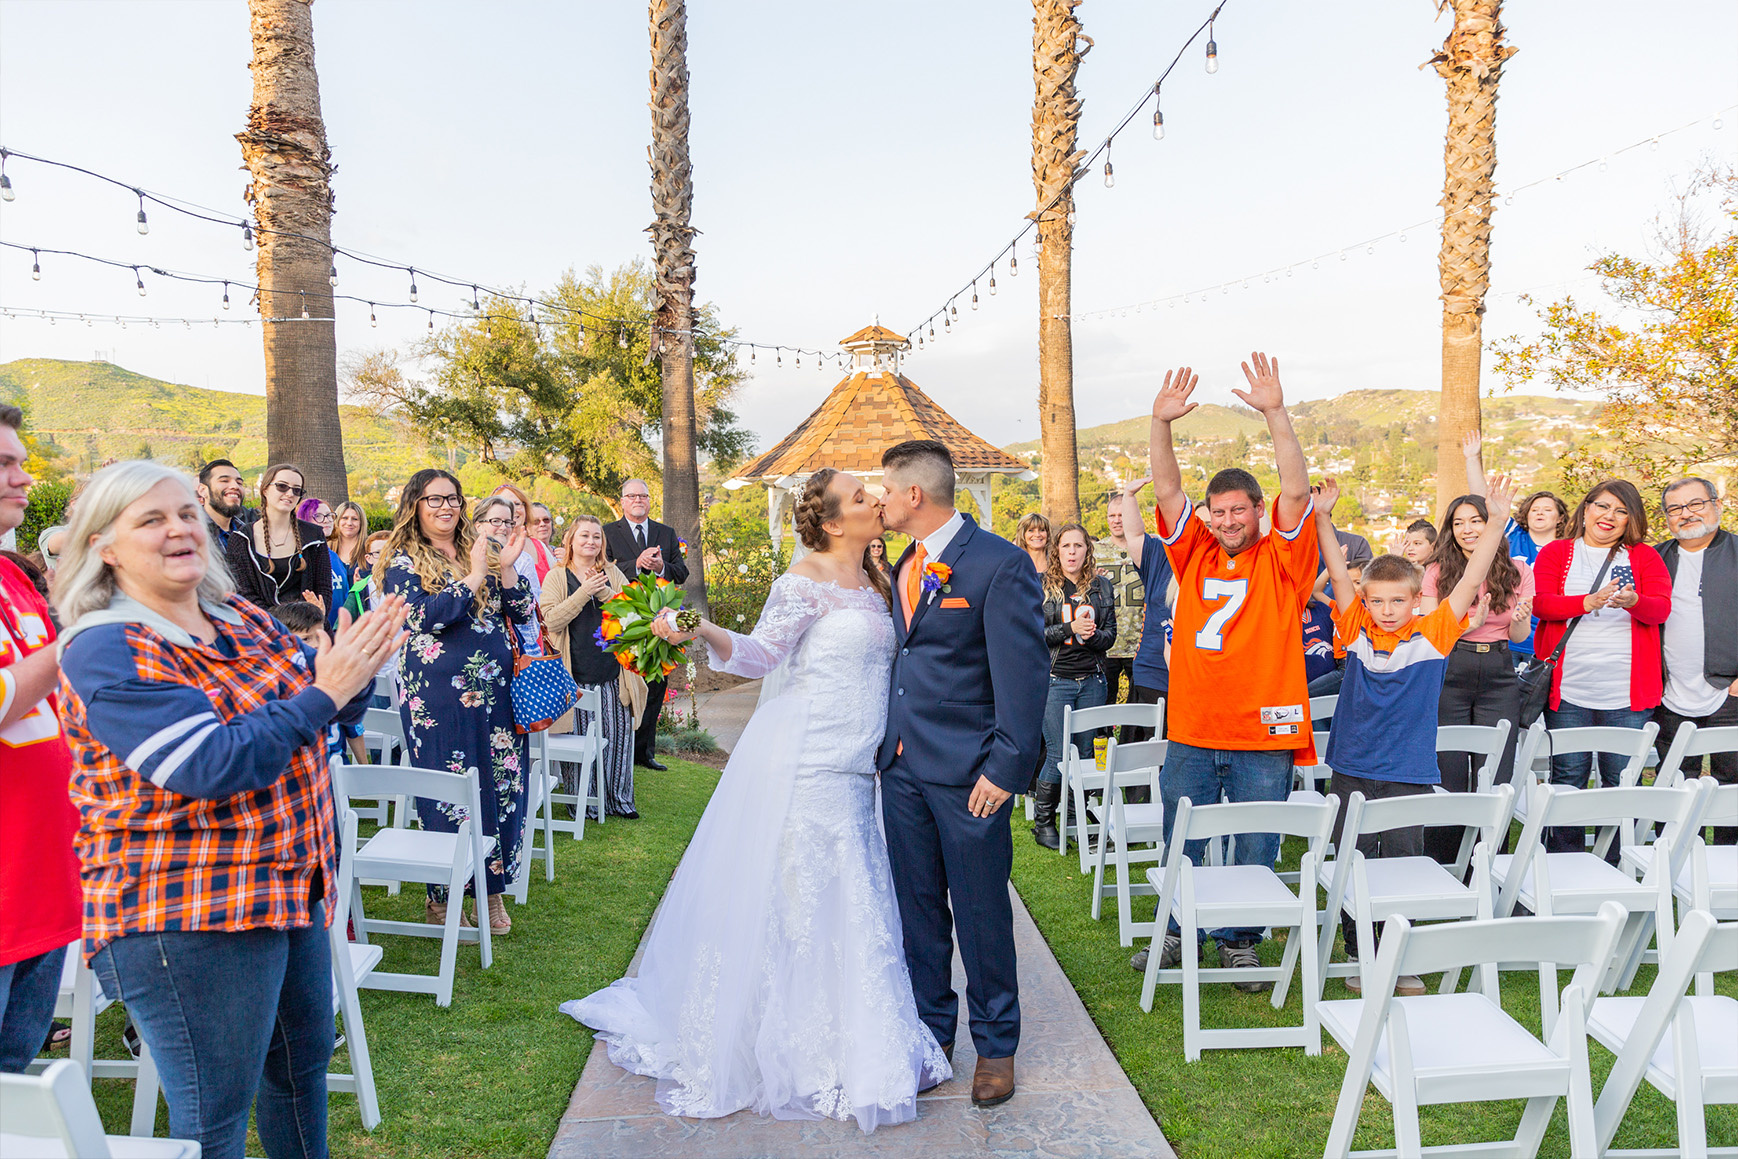 Happy newlyweds - Indian Hills - Riverside, California - Riverside County - Wedgewood Weddings